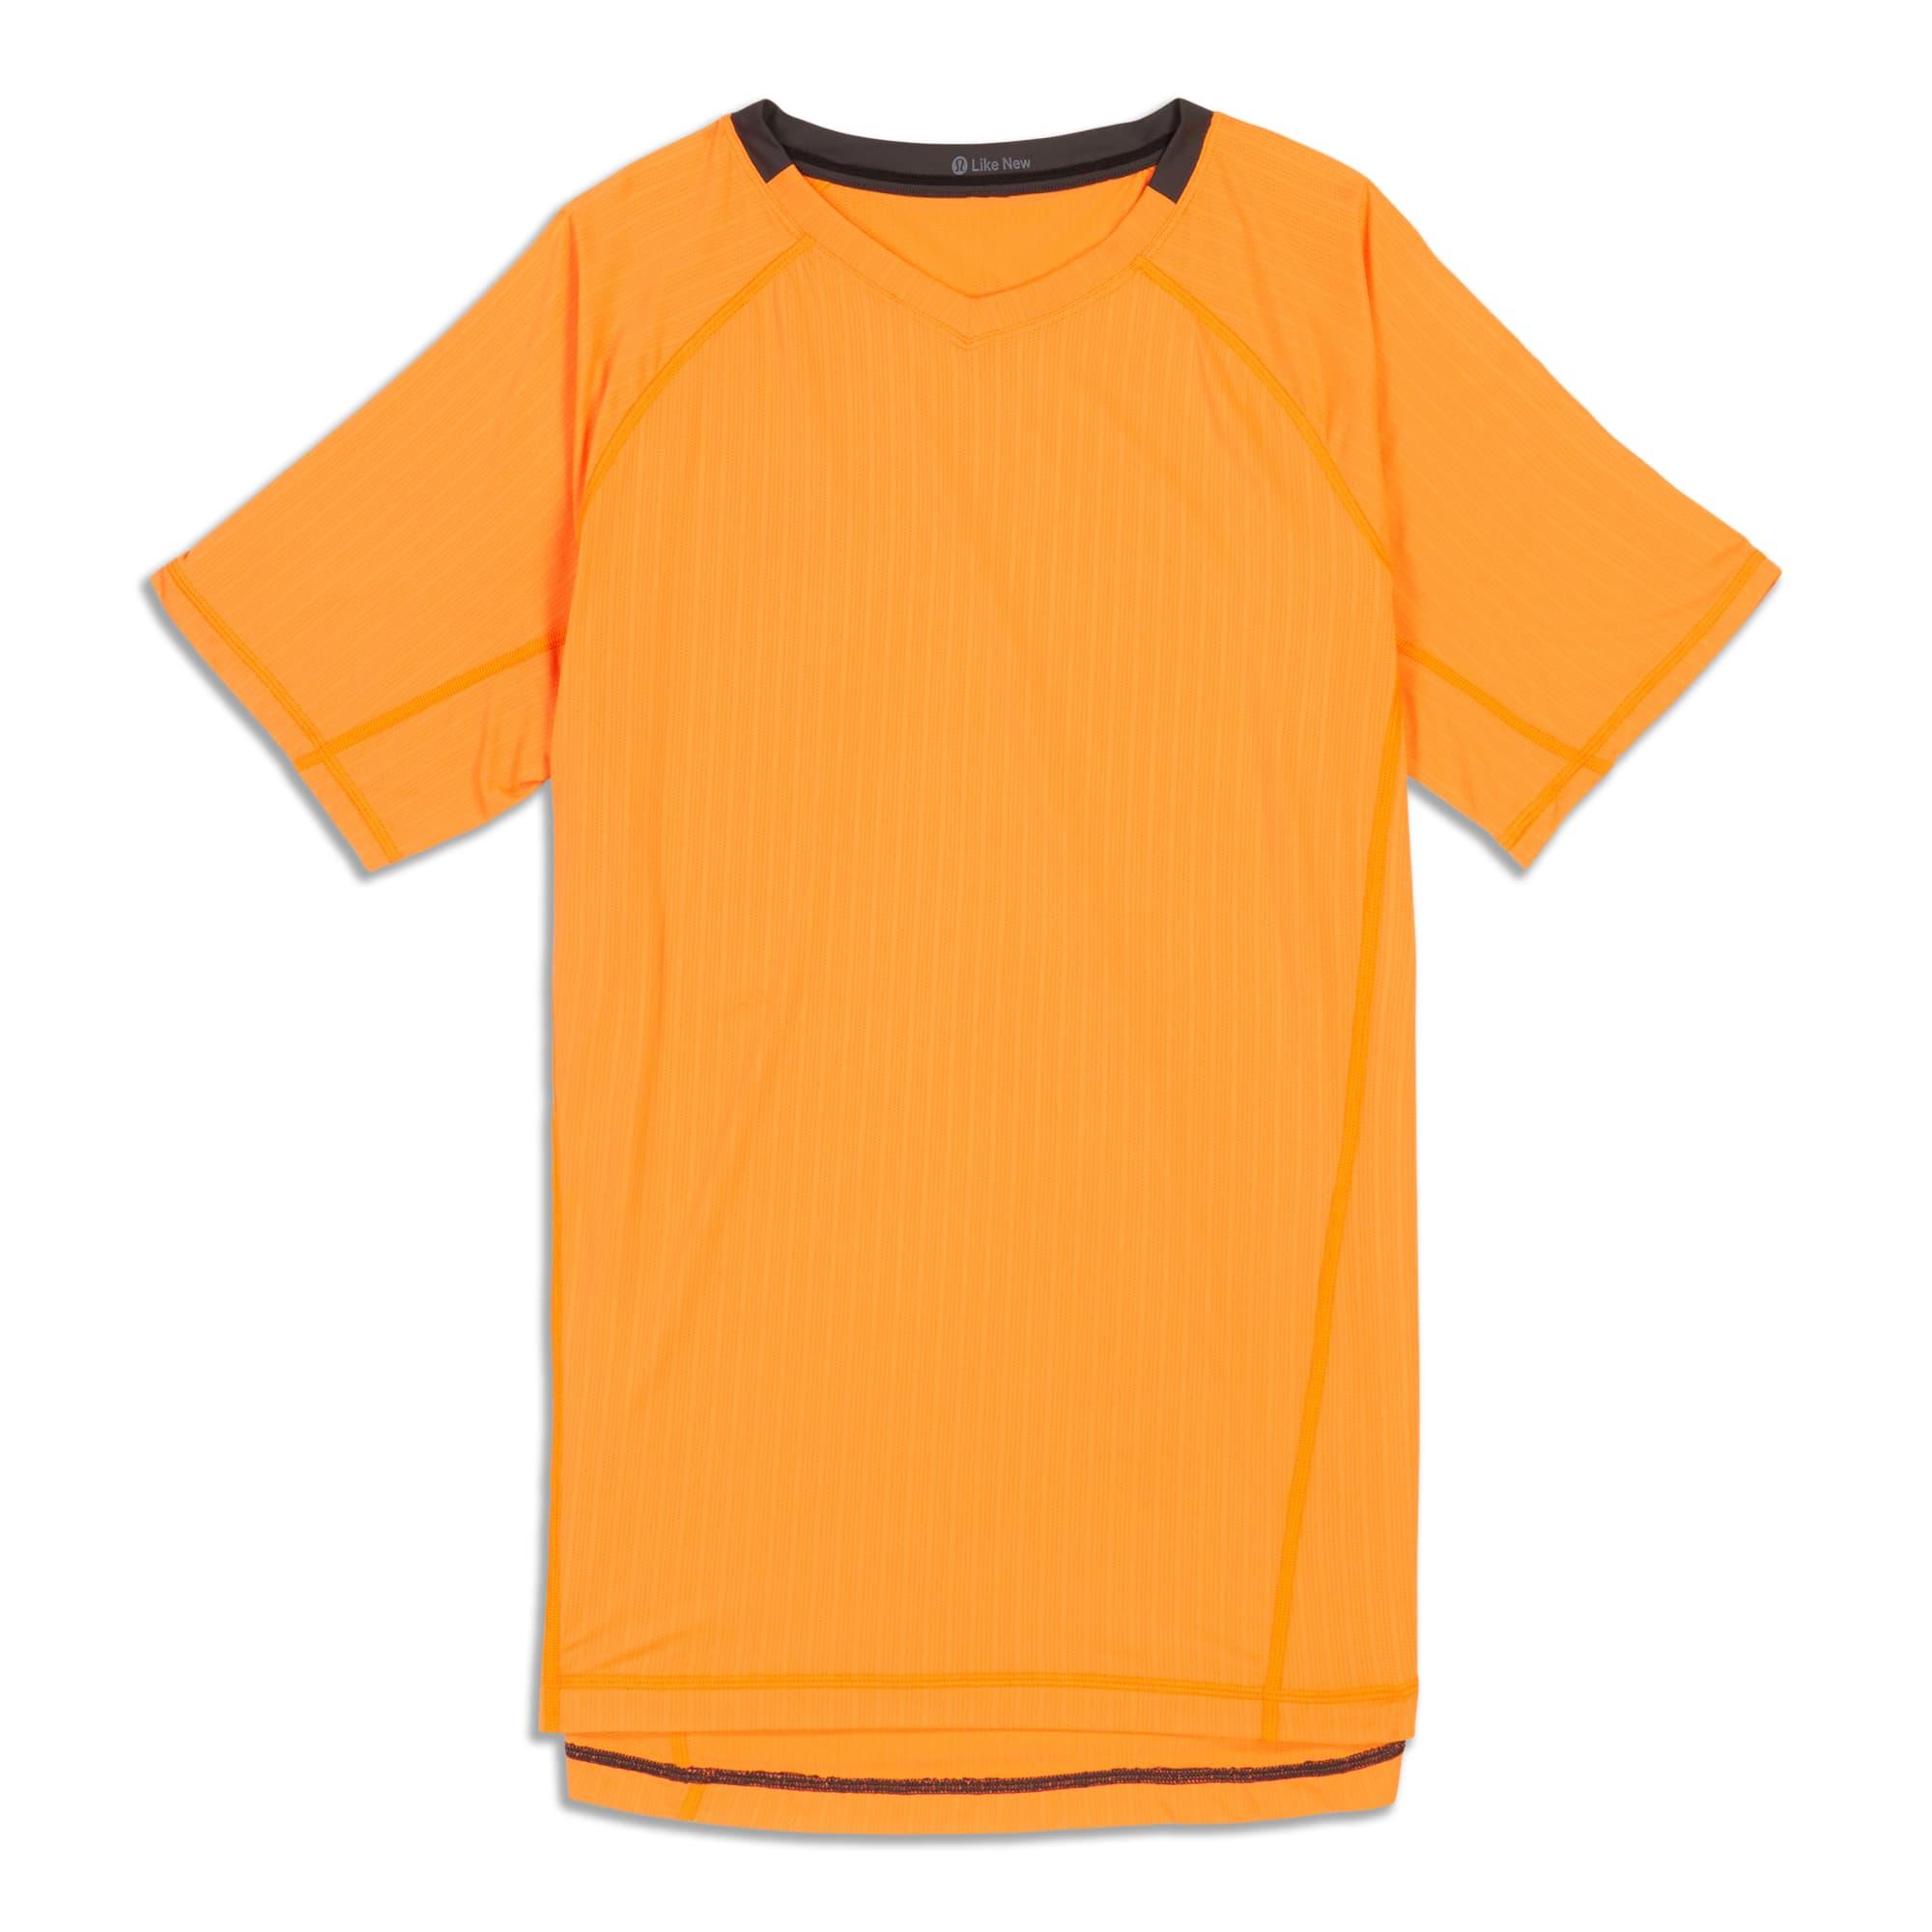 Main product image: Men's Short Sleeve Shirt - Resale